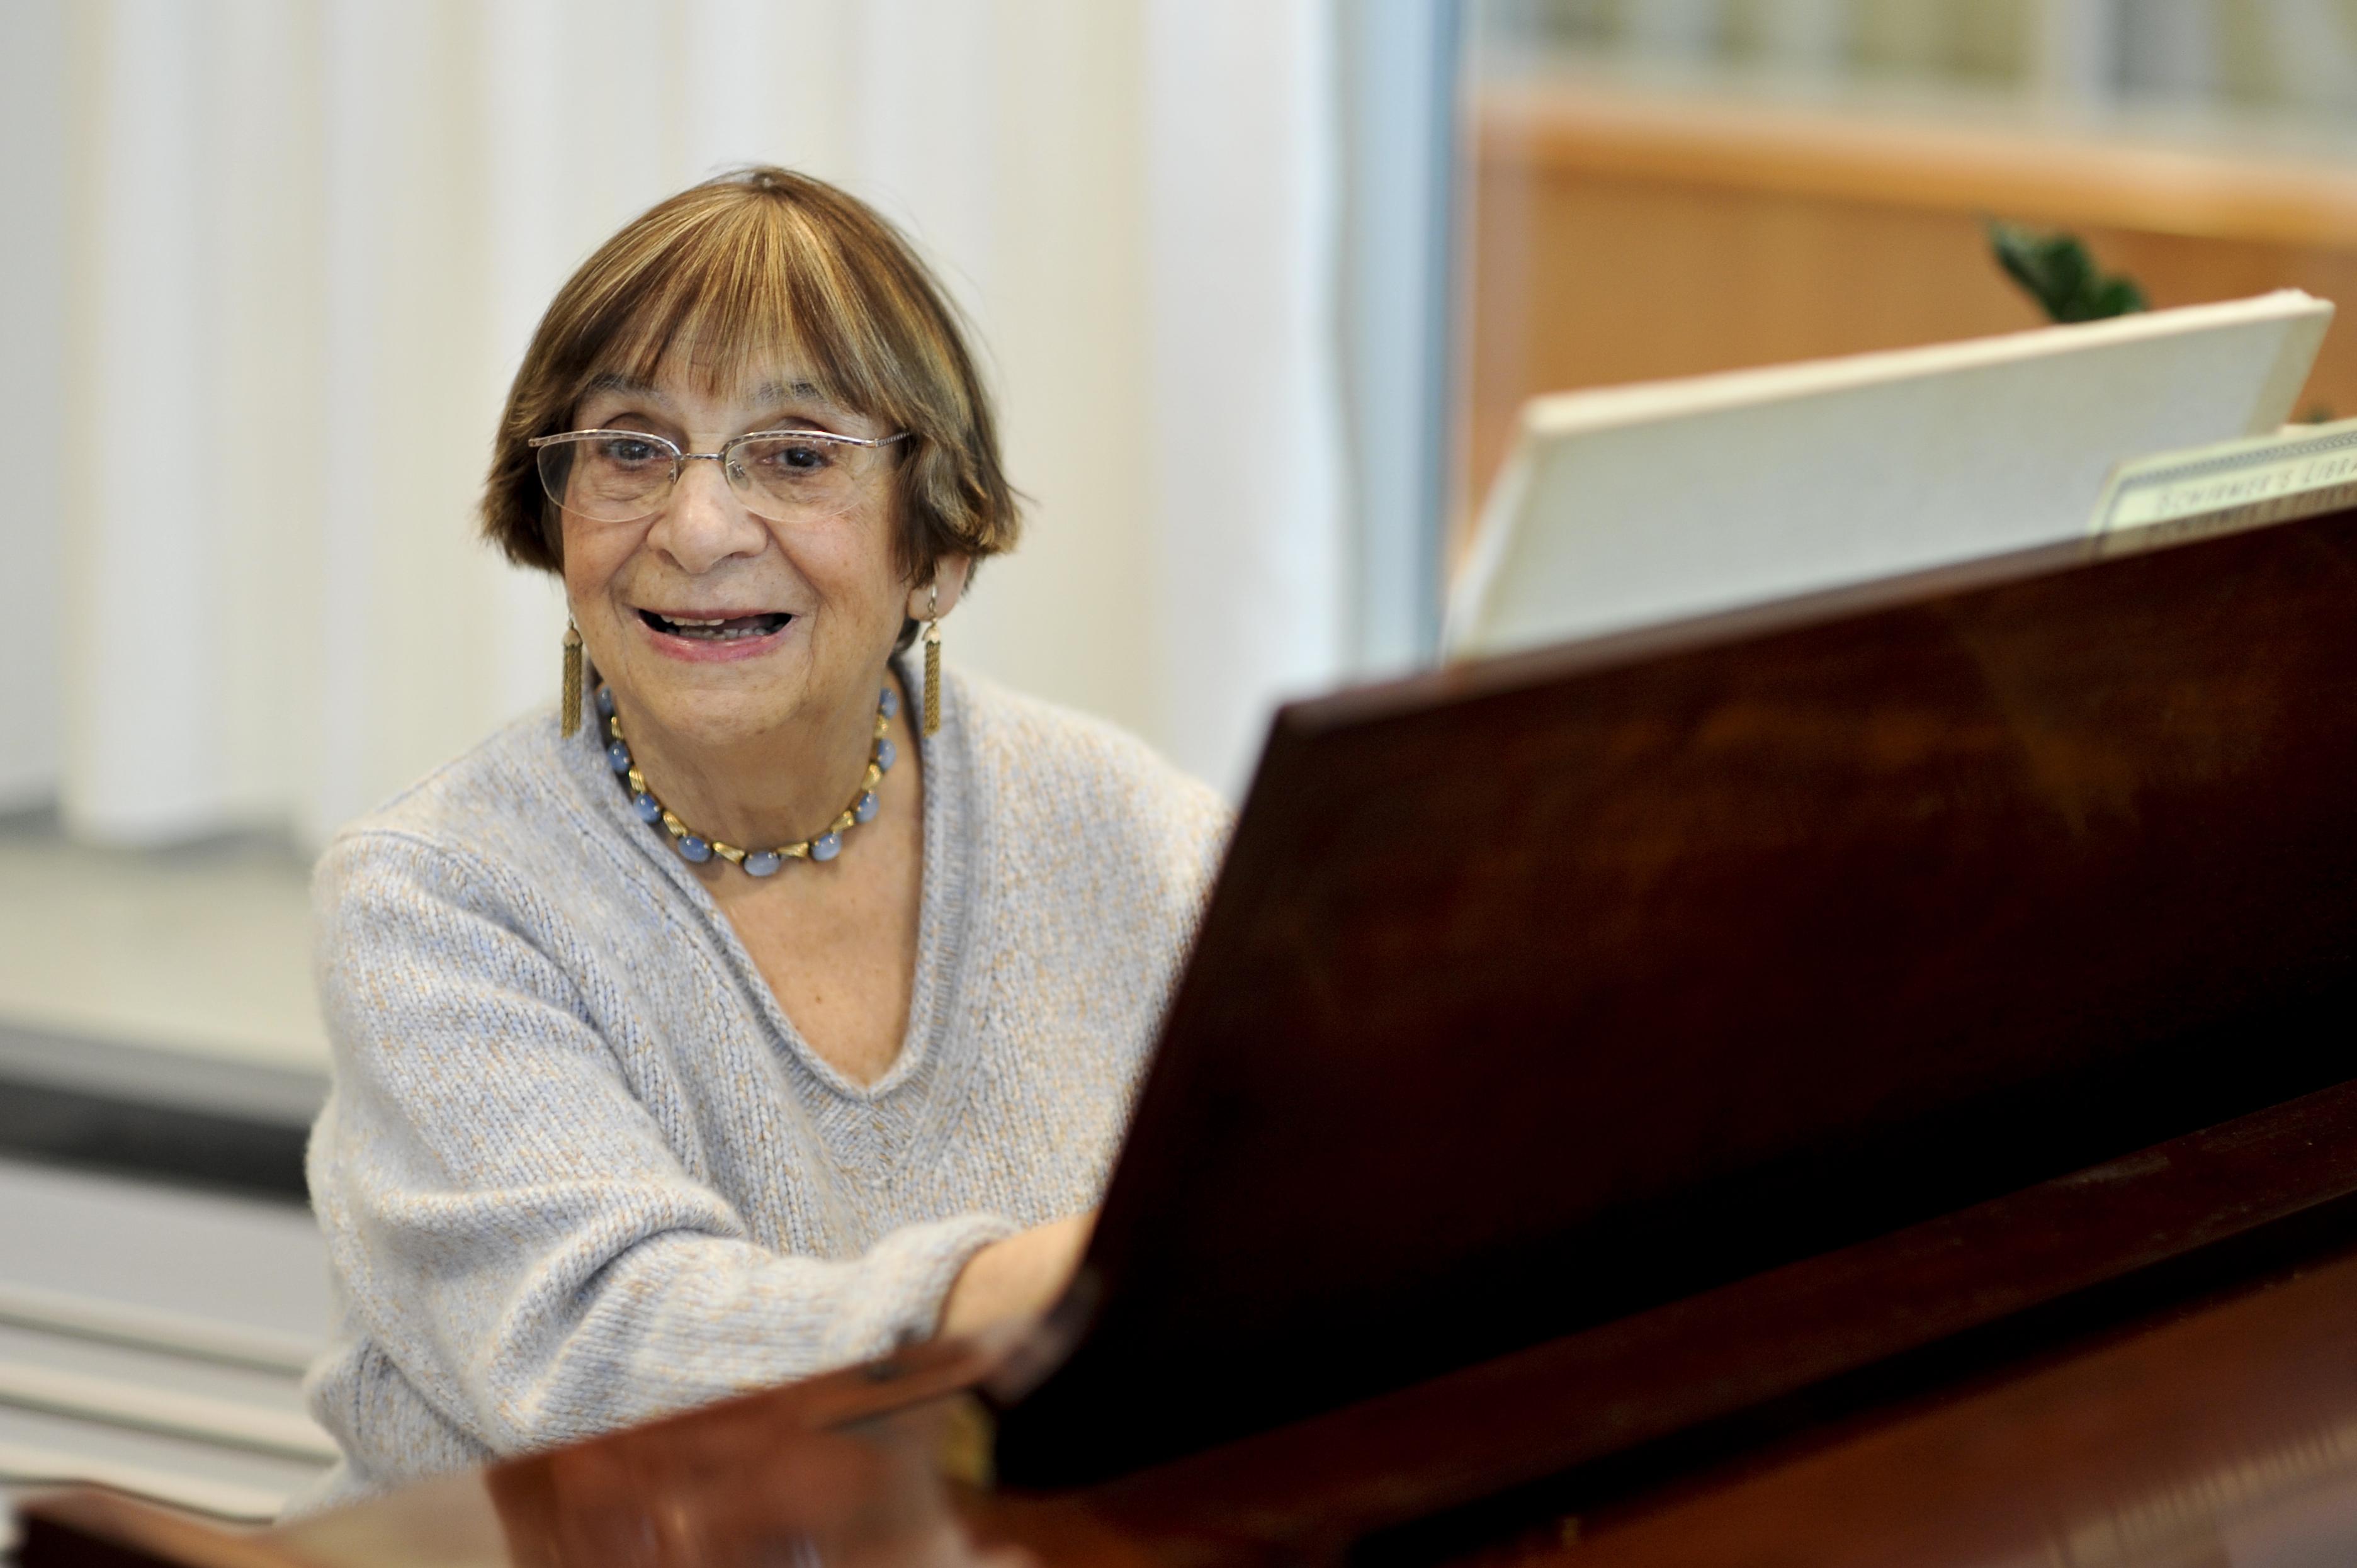 Ursula Mamlok at the piano (Photo by Simon Pauly)